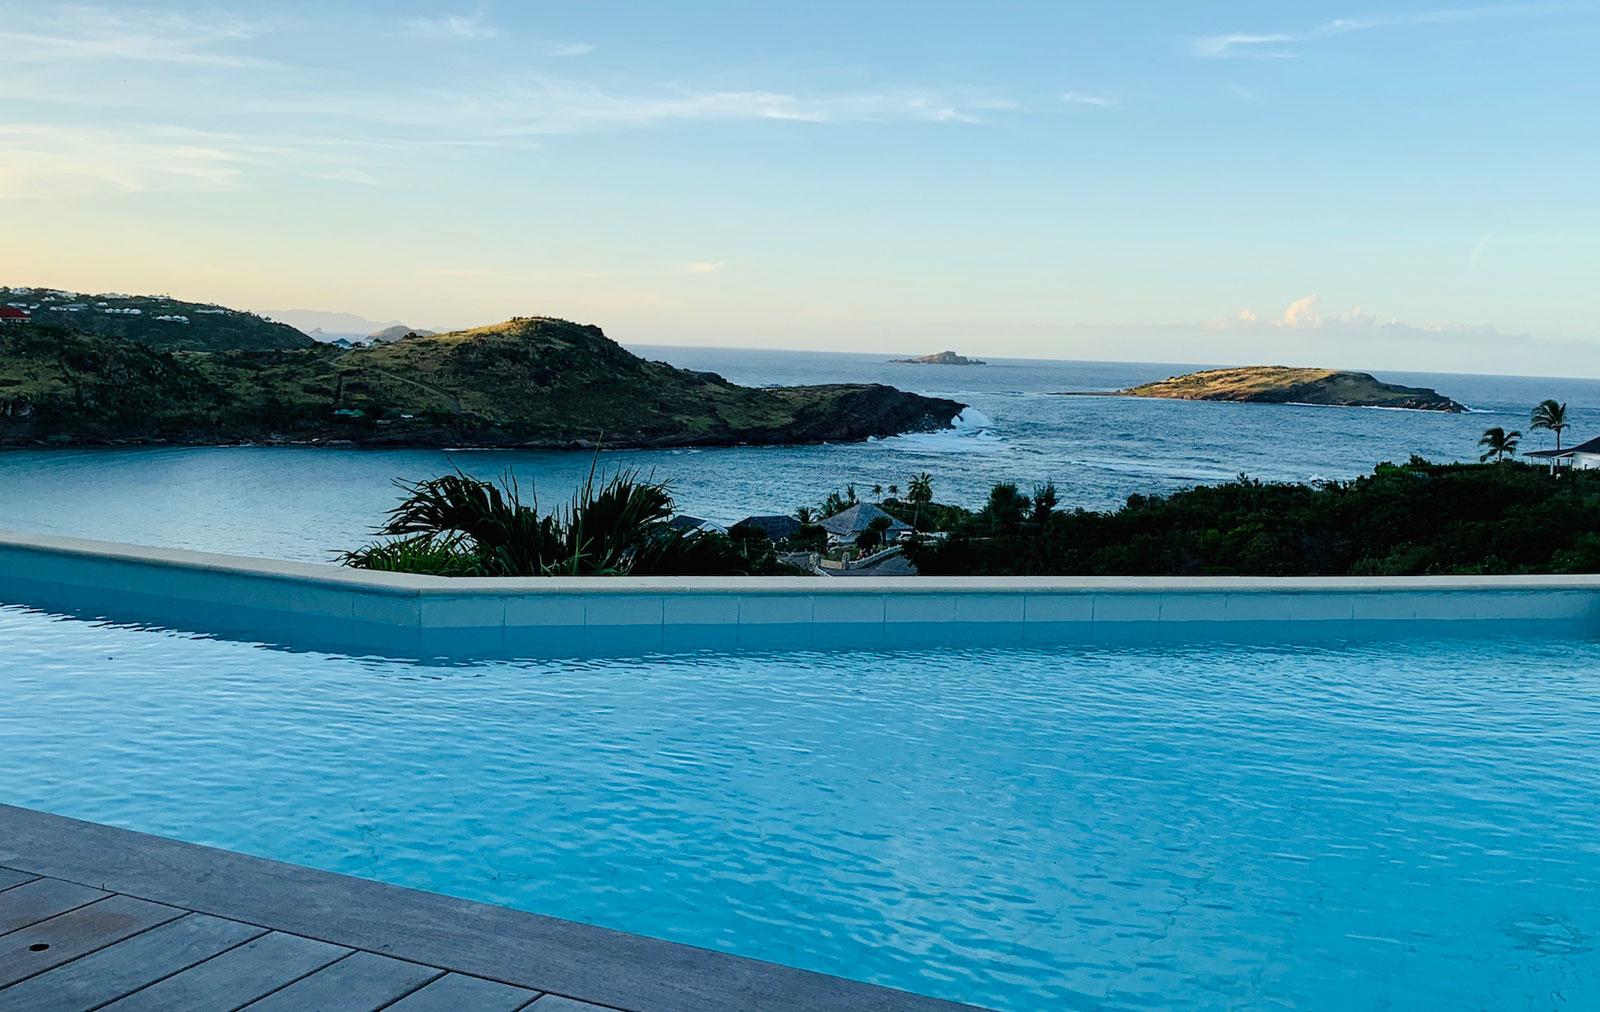 Villa Lagon Rose - Spacious Villa Rental St Barth Petit Cul De Sac with Beautiful Sea View - Sea view